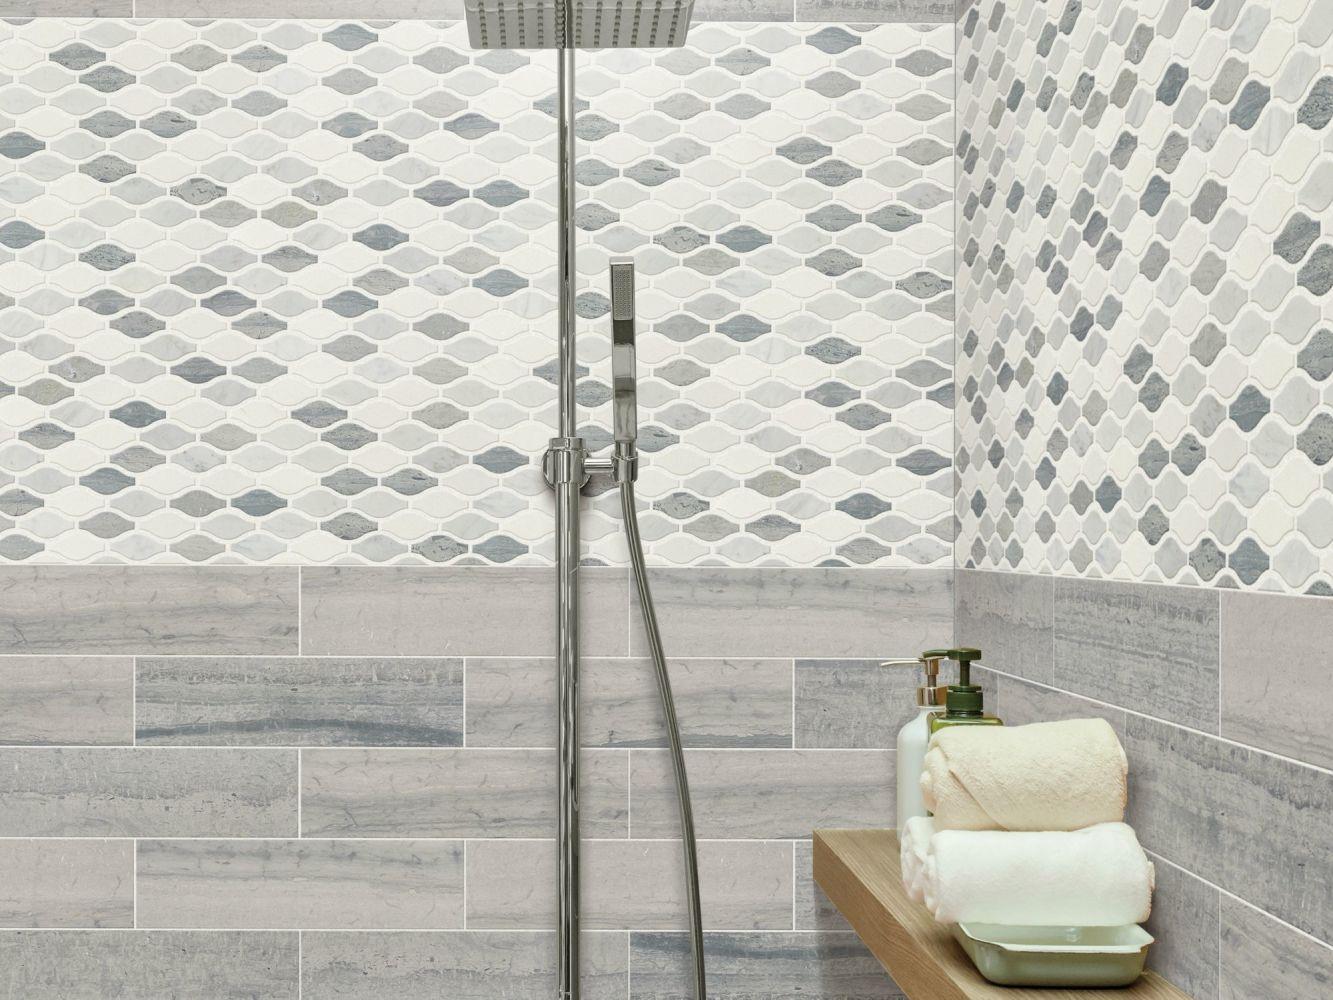 Shaw Floors Home Fn Gold Ceramic Estate Ornt Mo Bianco C Blue G Thas 00511_TG89B